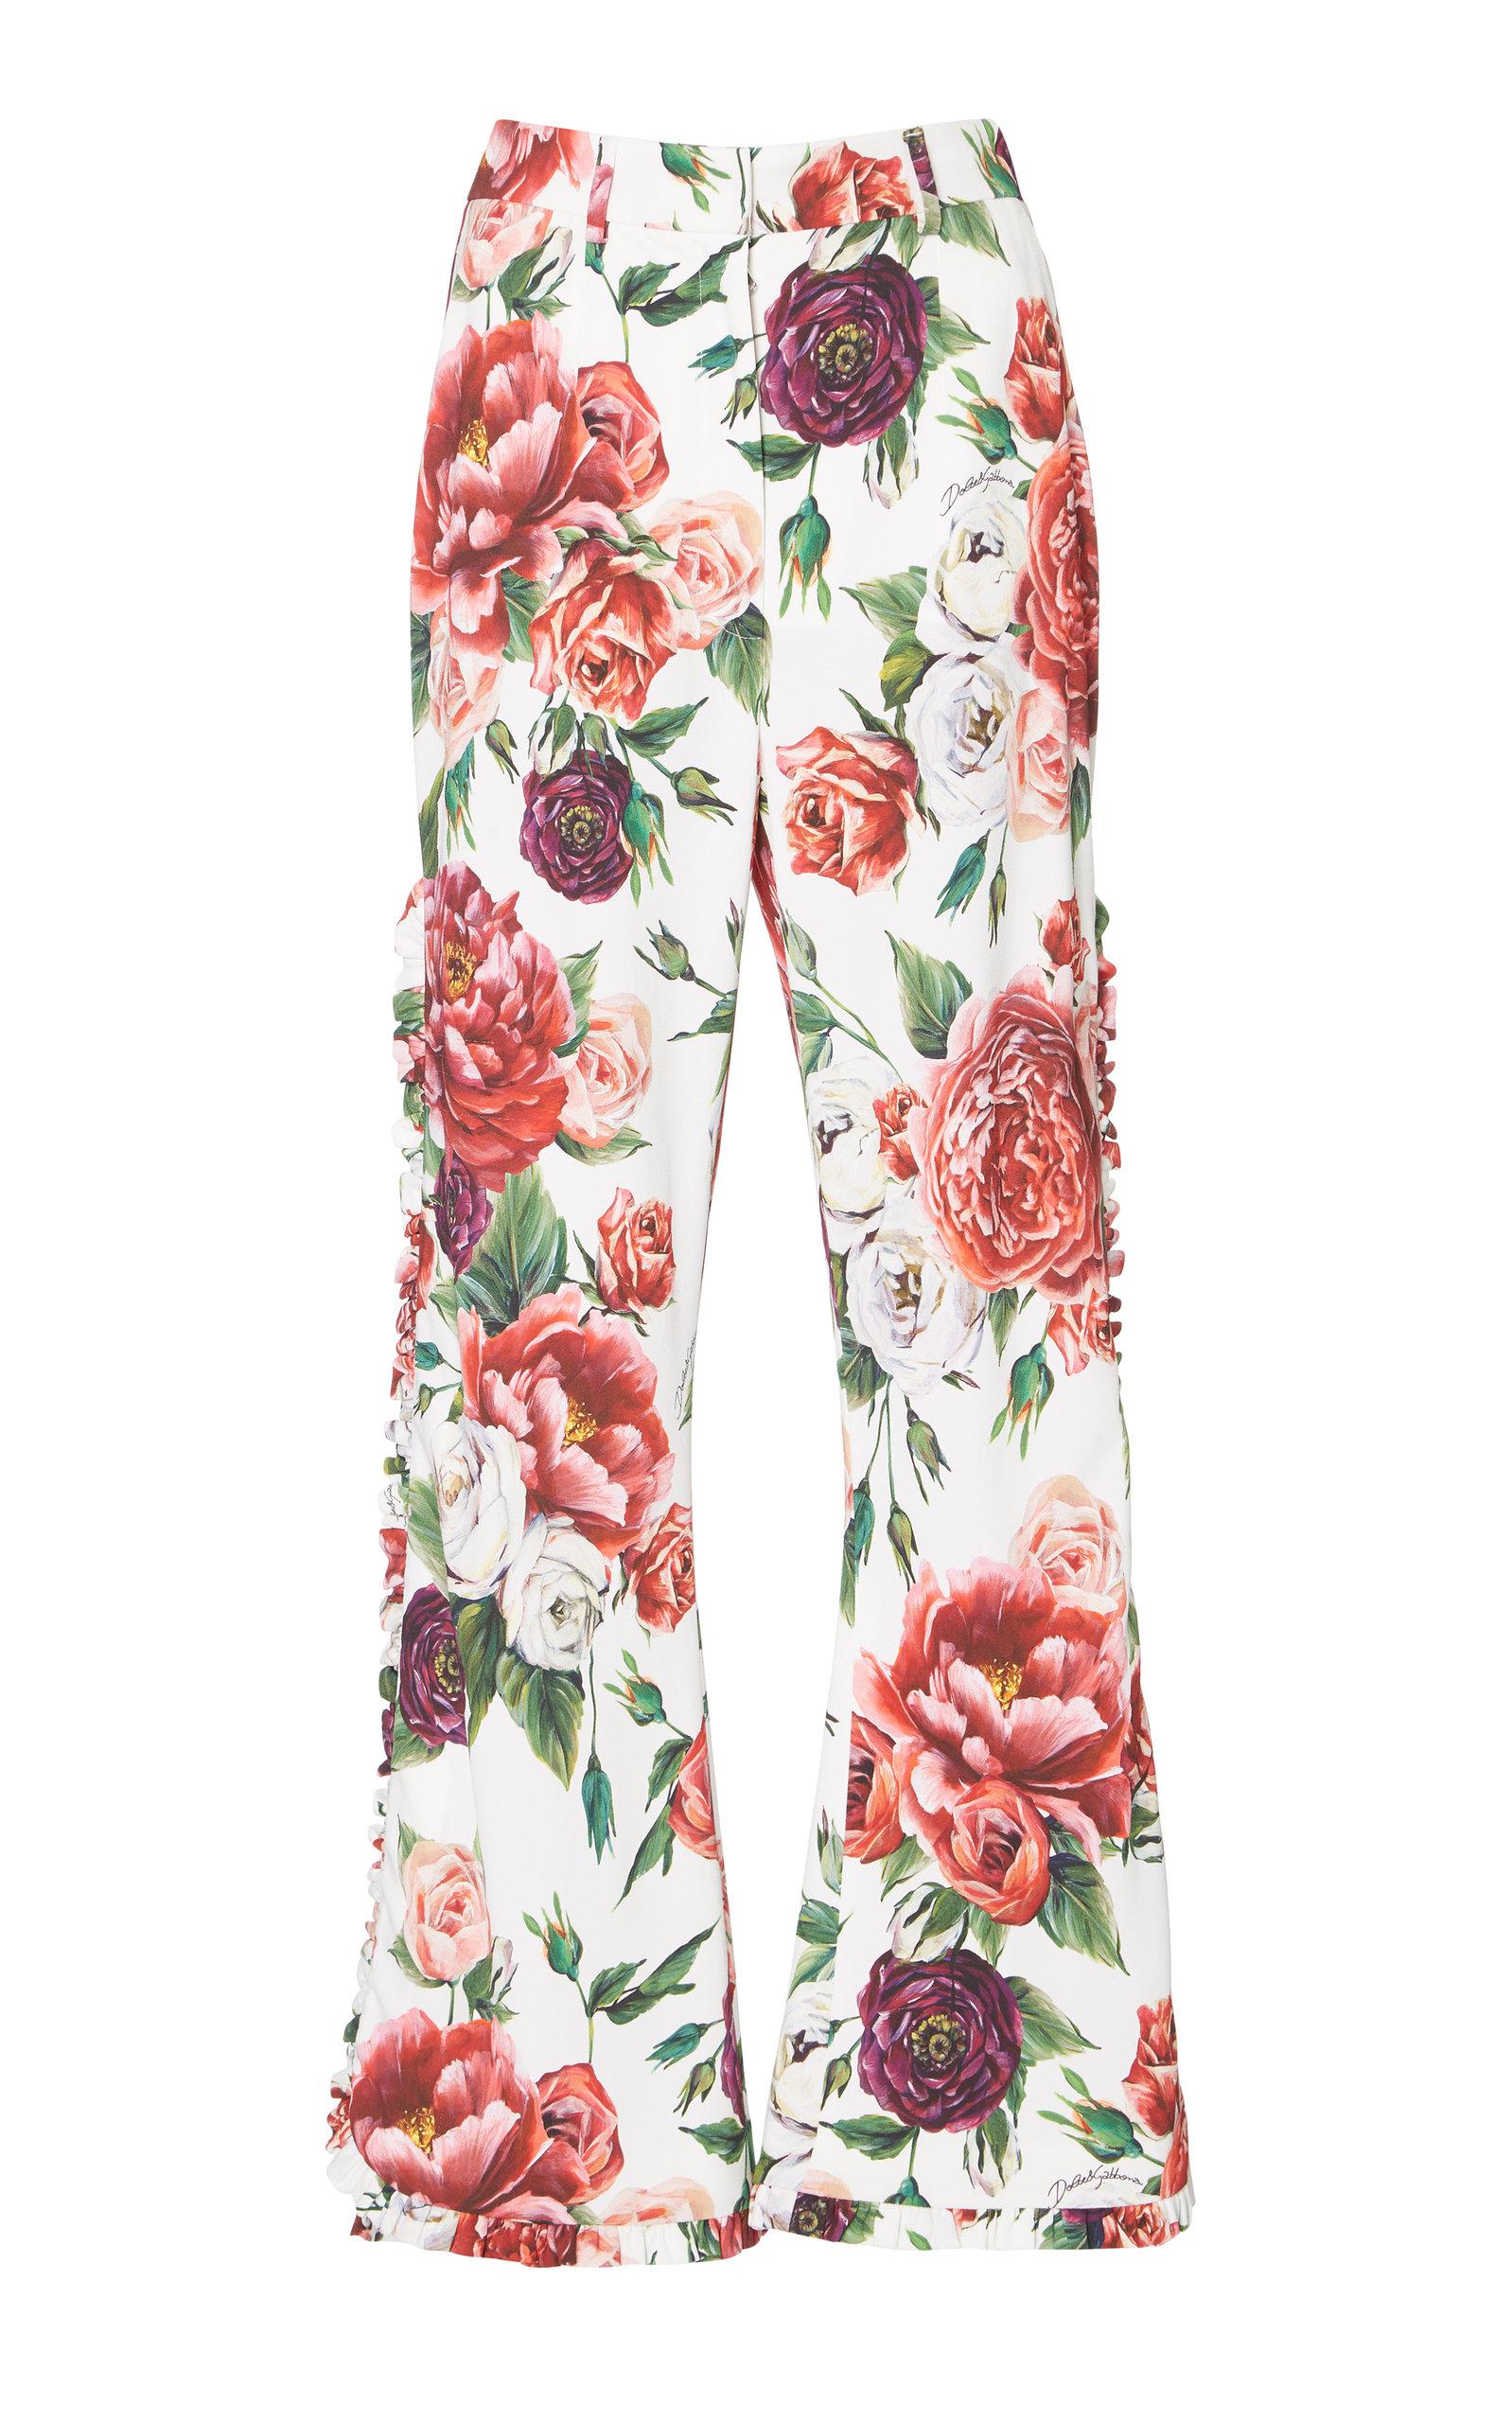 peony print track pants - White Dolce & Gabbana R36g9pXx